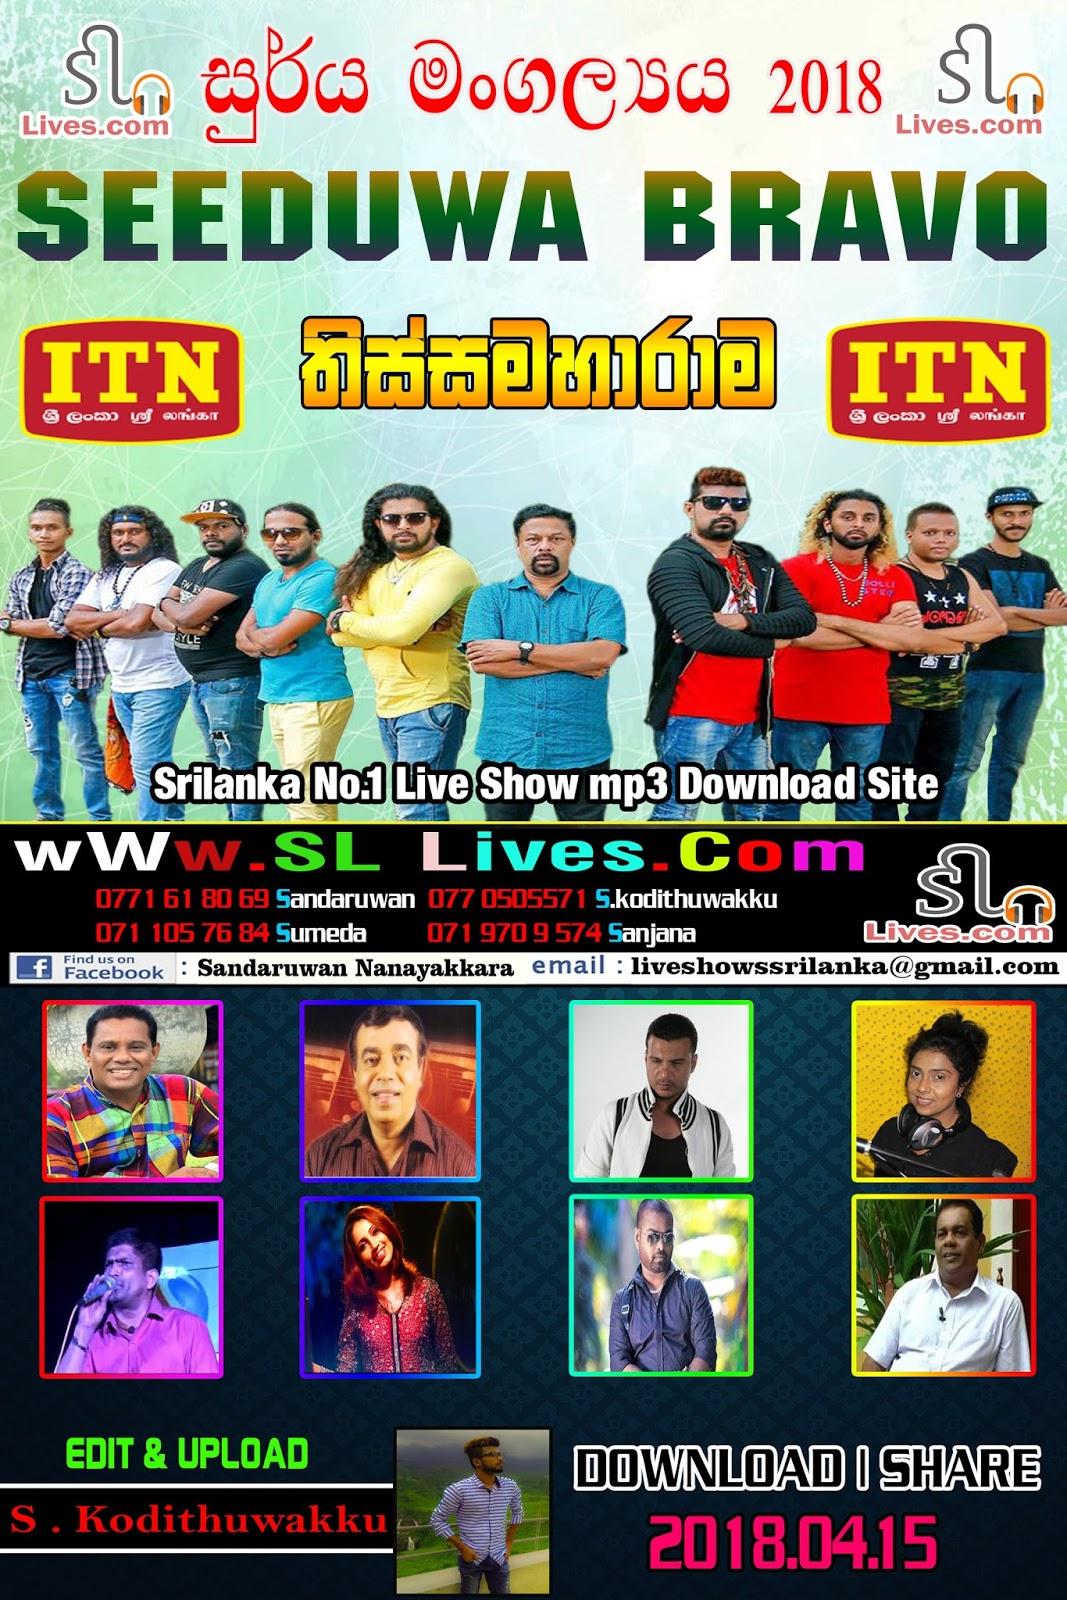 Sri lanka live show mp3 download